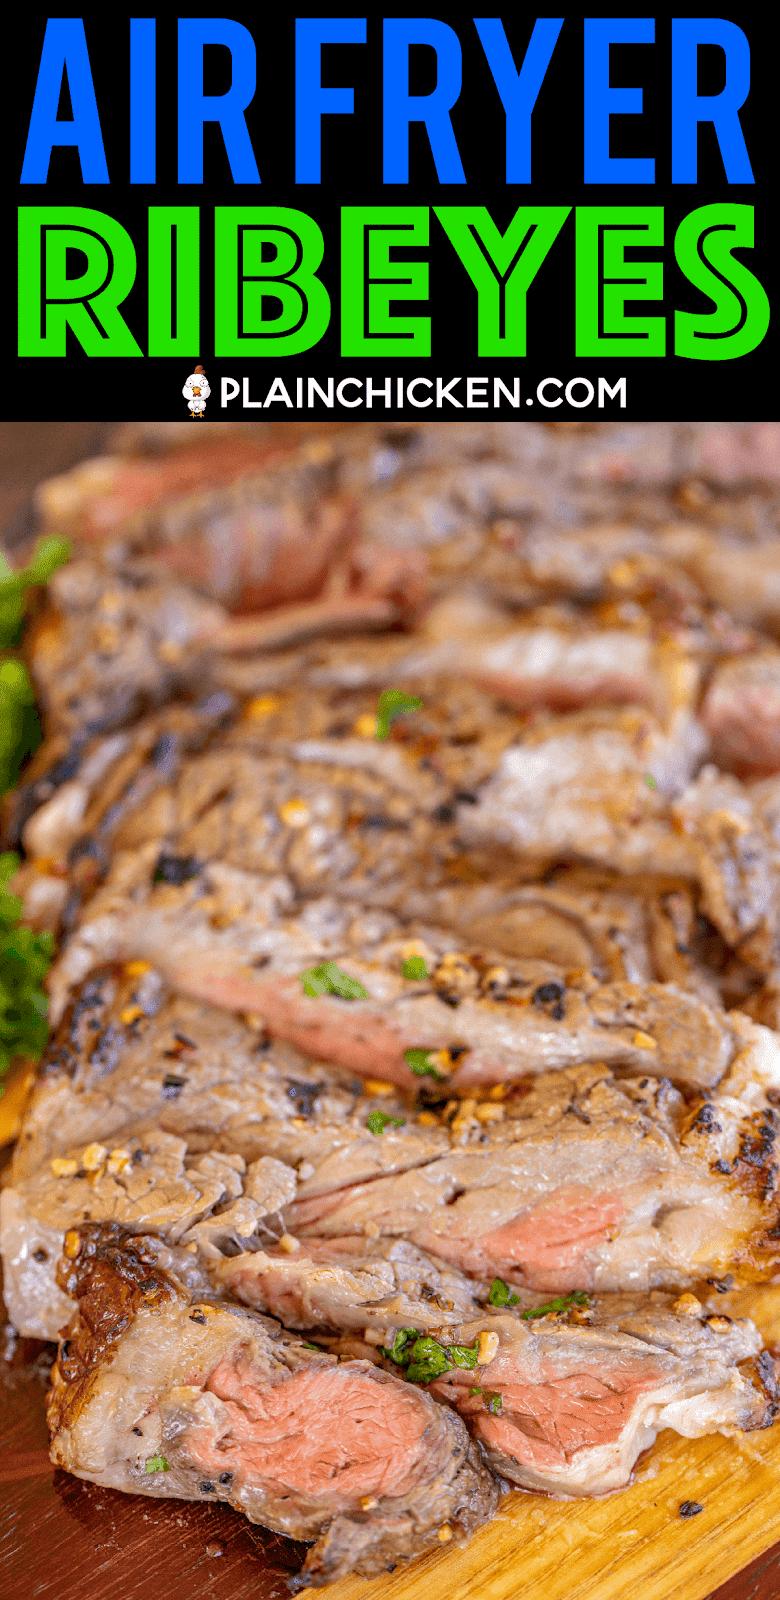 sliced ribeye steak